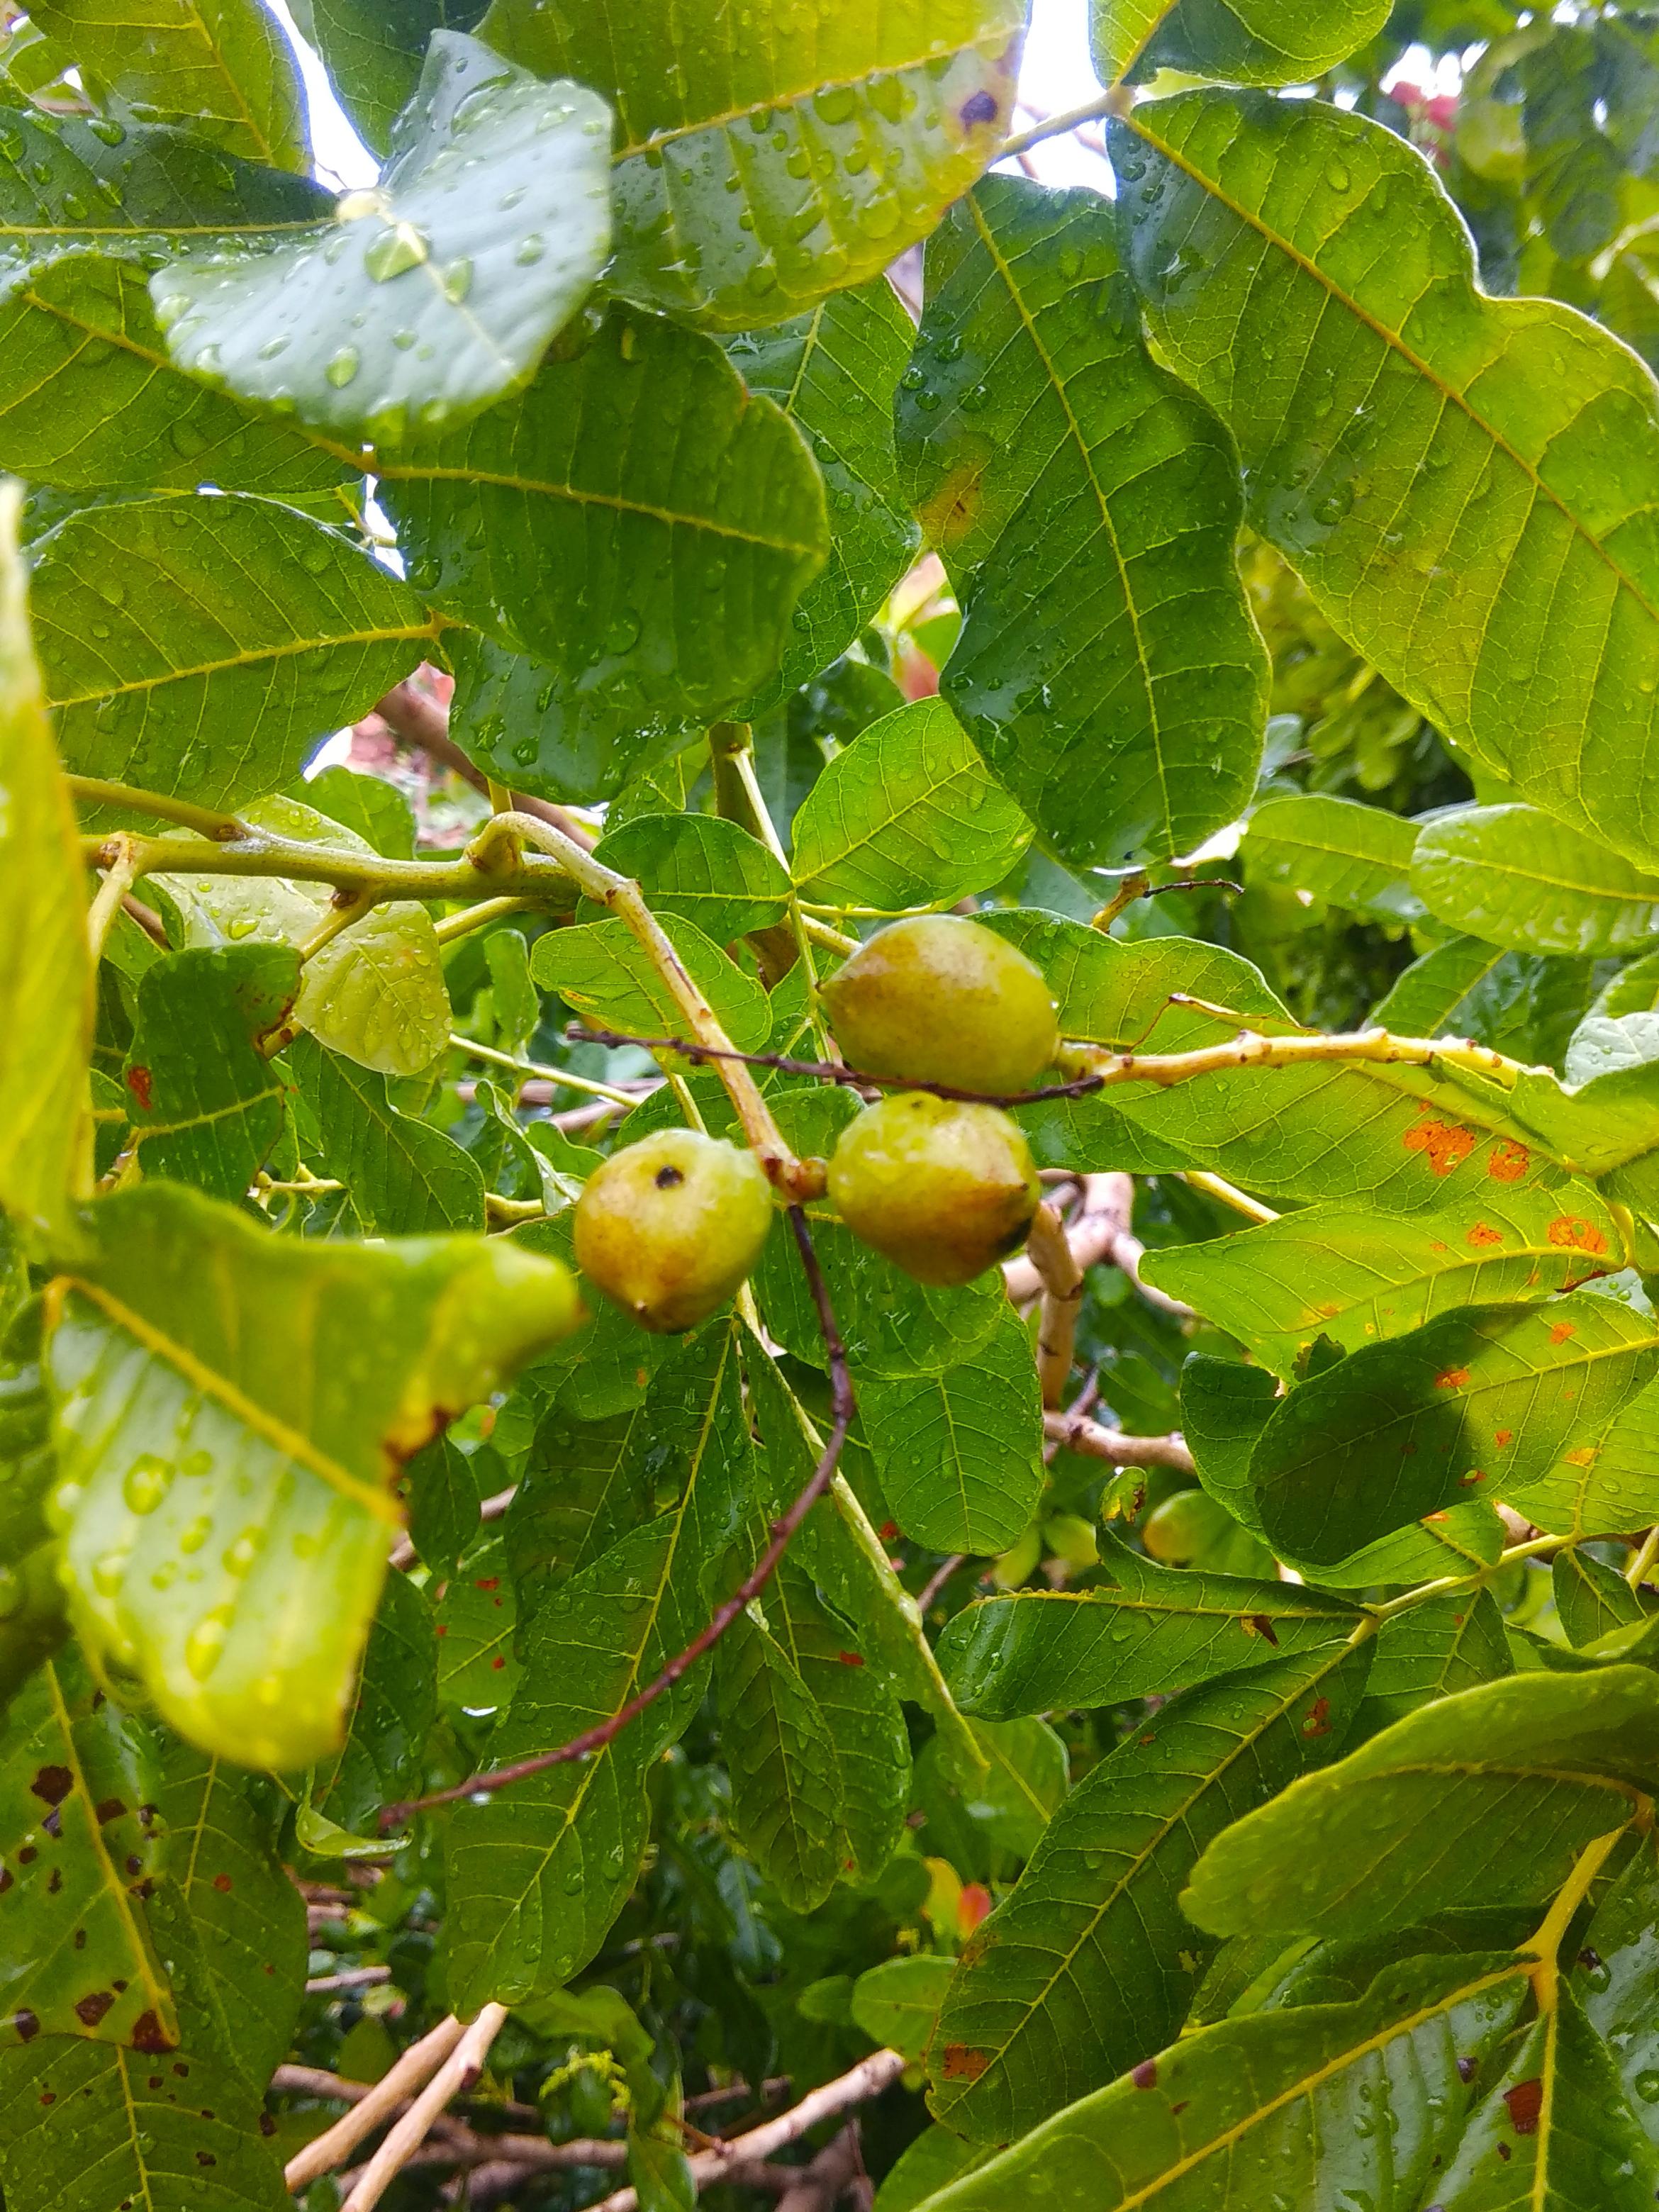 File:'+arya+' Schleichera oleosa ꦏꦼꦱꦩ꧀ꦧꦶ kesambi pilang Kramat 2019 1.jpg